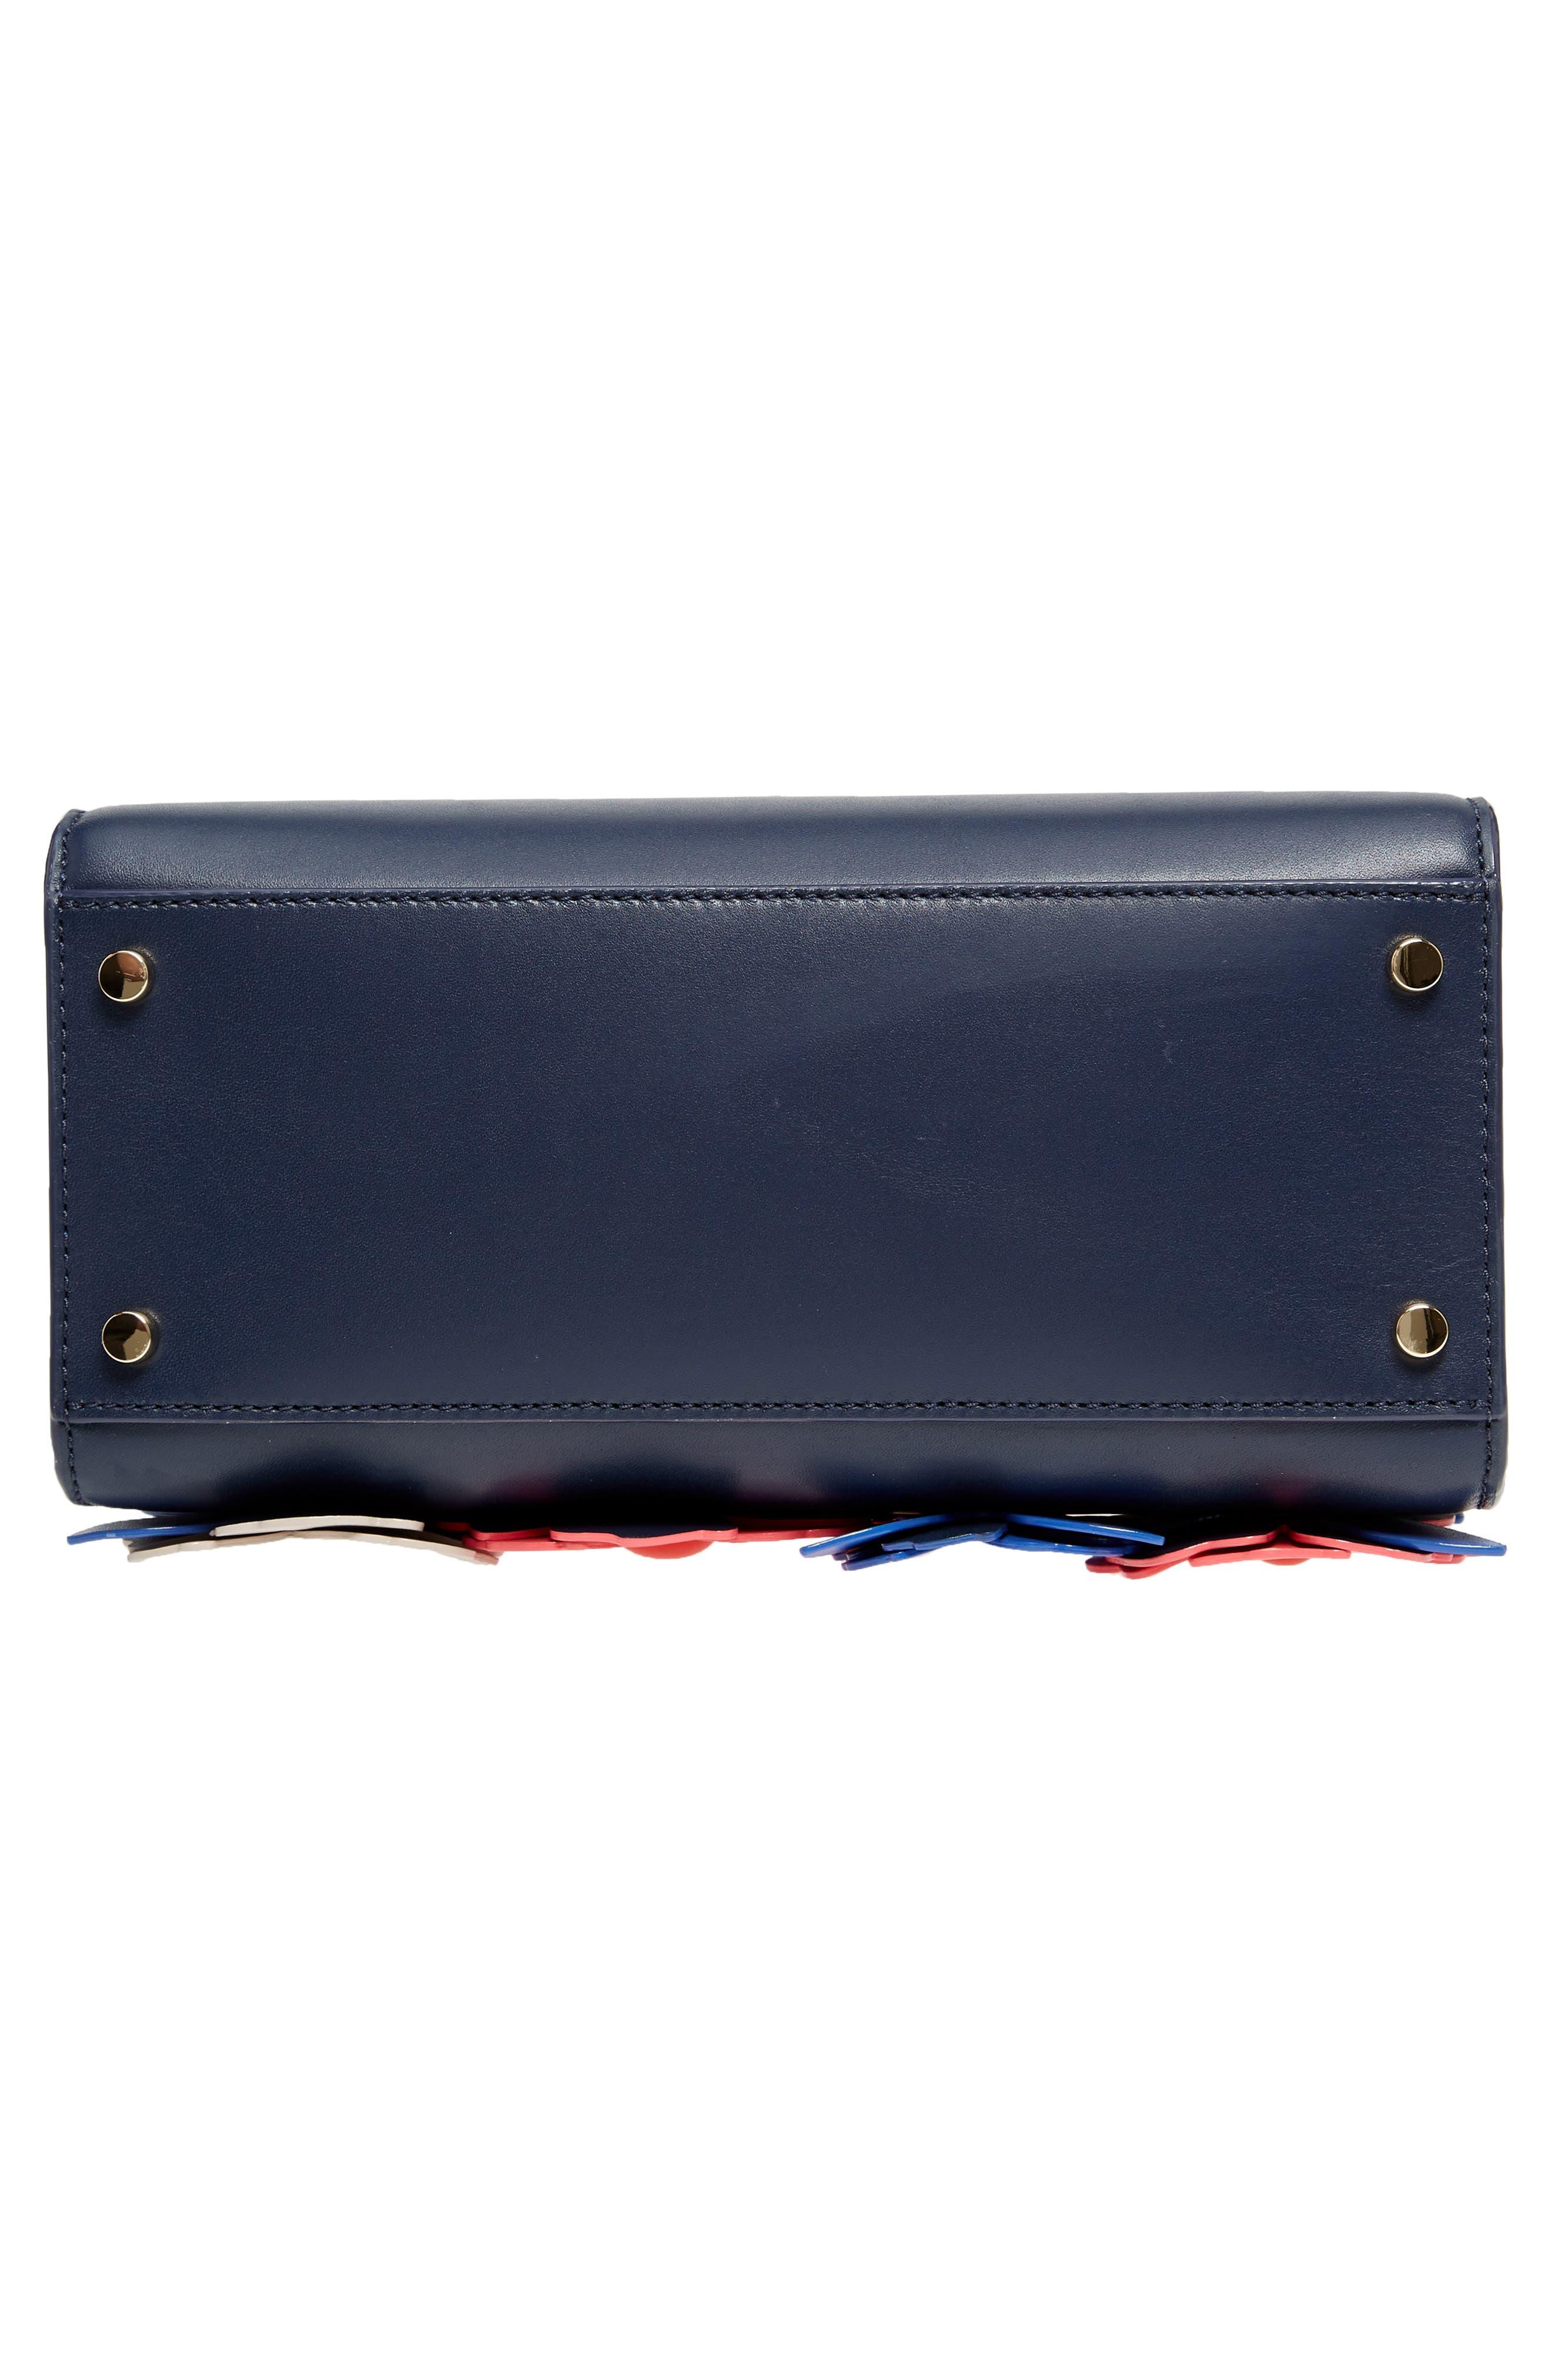 madison daisy lane – sam leather handbag,                             Alternate thumbnail 6, color,                             Blazer Blue Multi